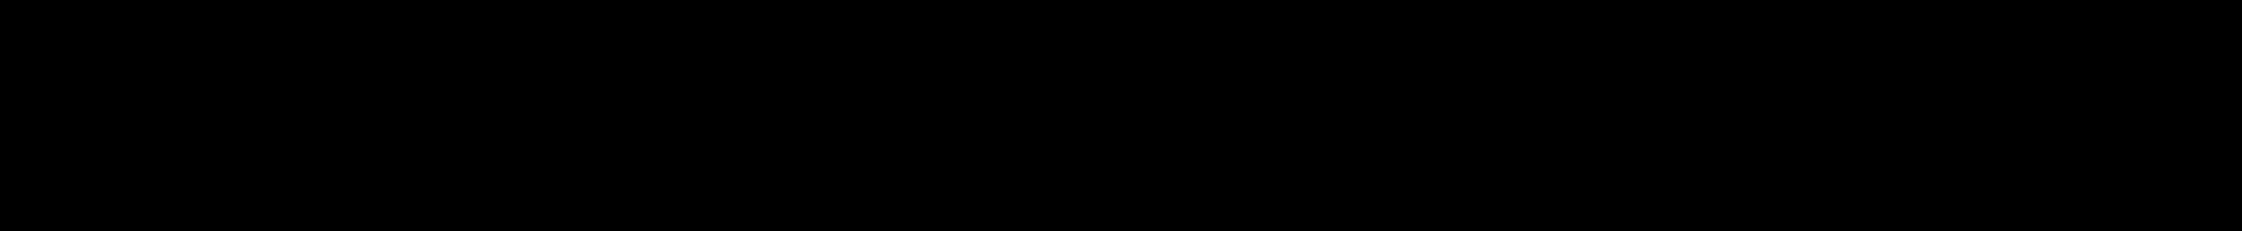 Blue Goblet Drawn Normal Regular